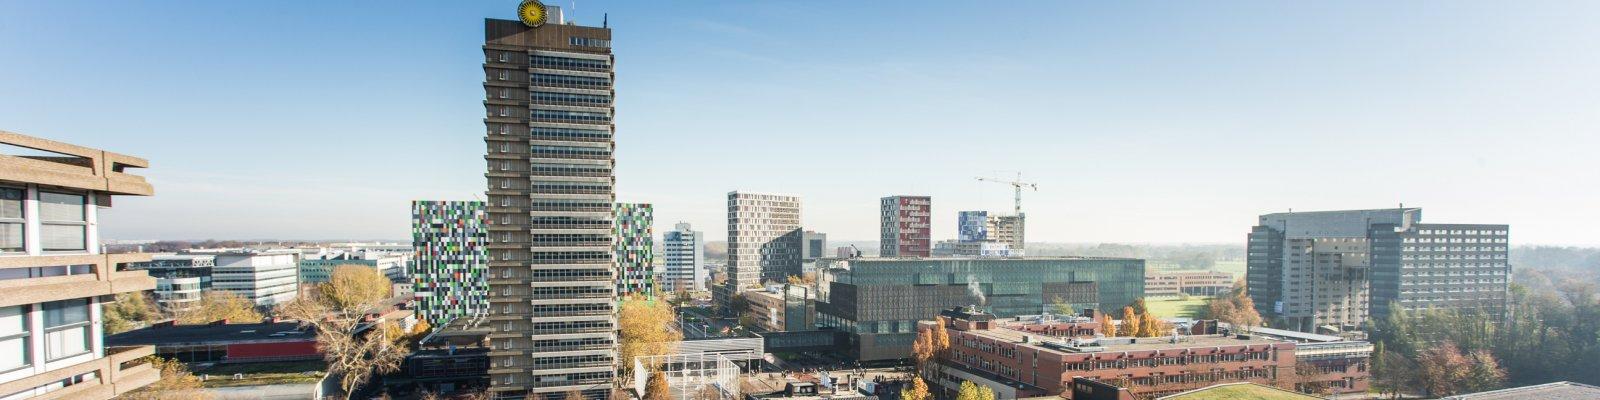 Utrecht Science Park